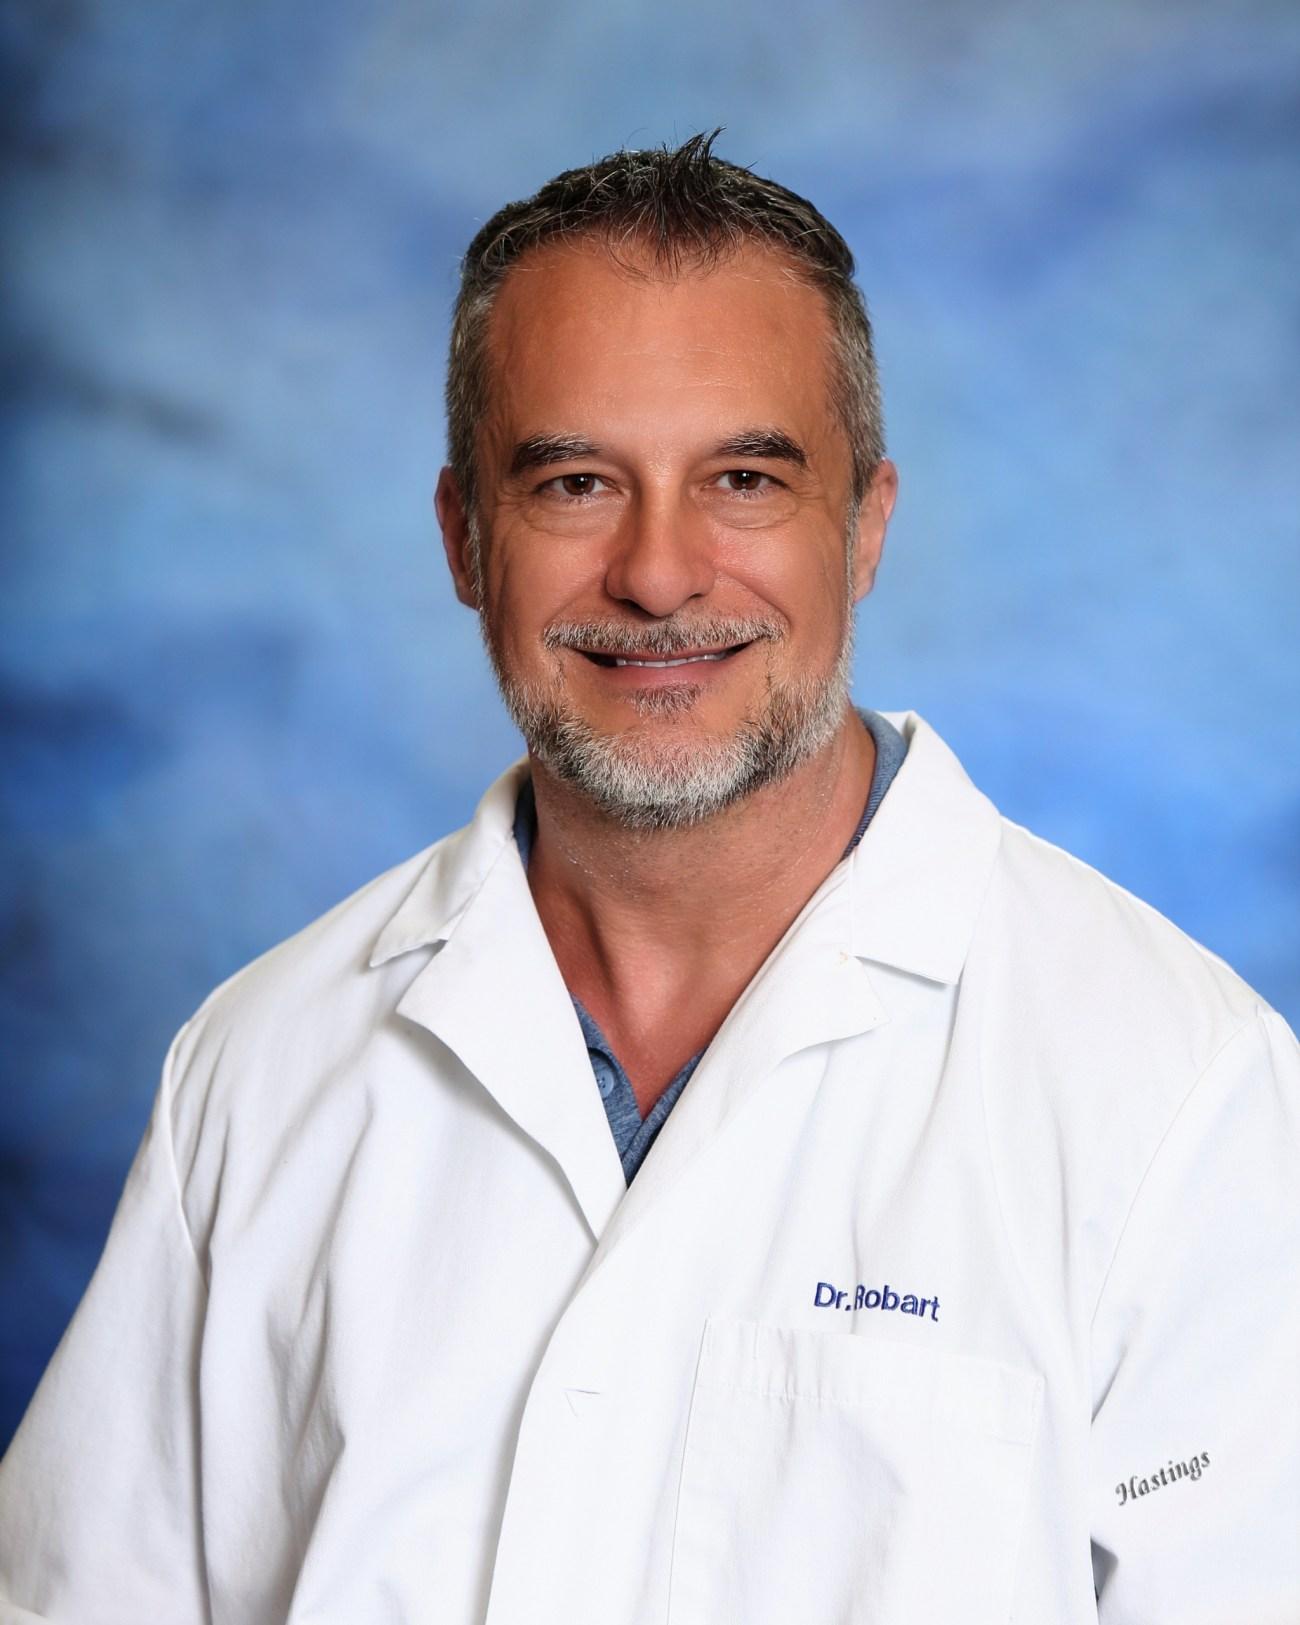 Dr. James Robart Jr, CME, DC, DABCN, DABCI